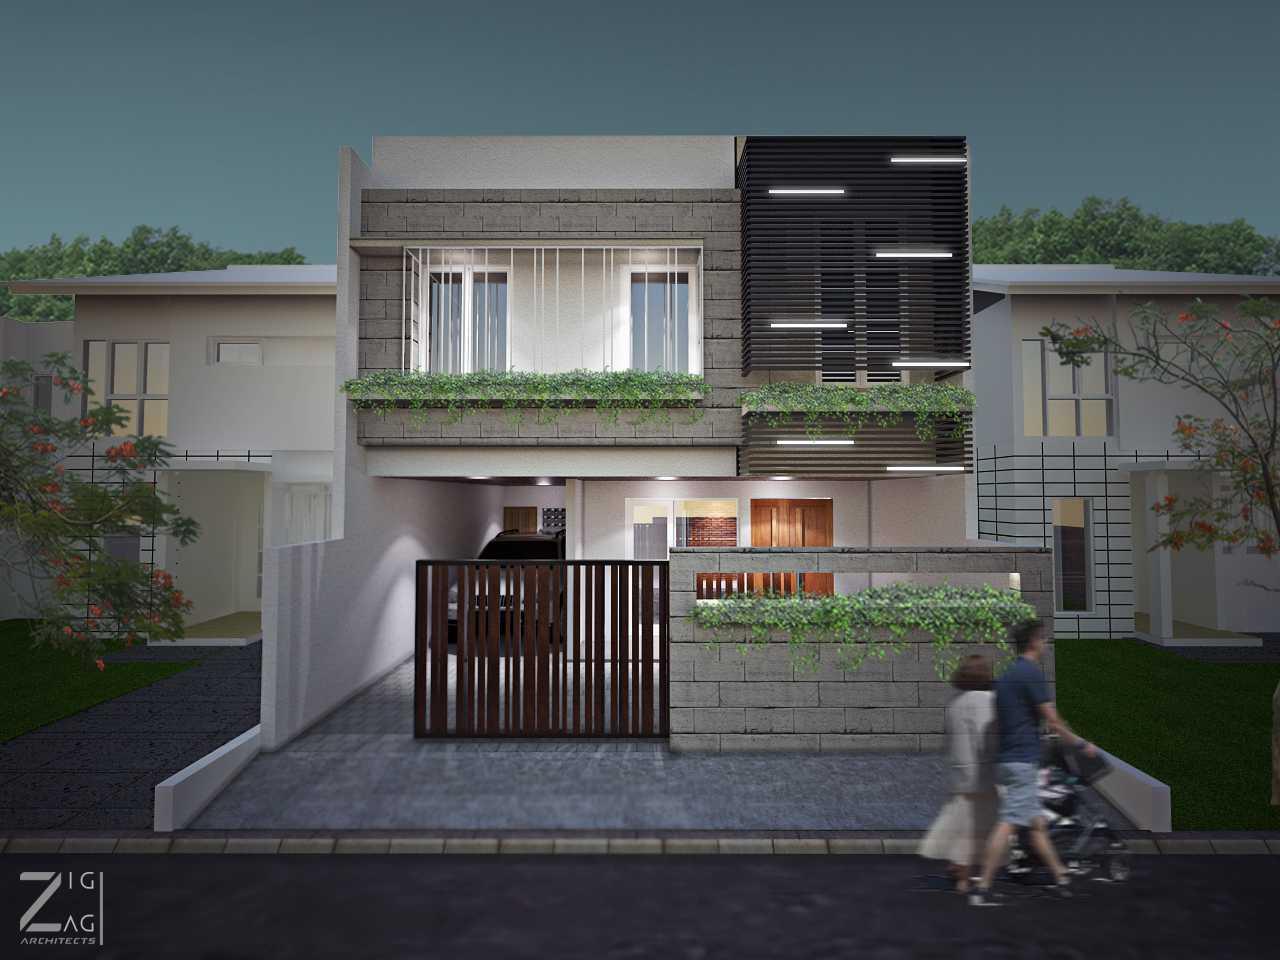 Zigzag Architecture Studio Box House  Ciledug, Kota Tangerang, Banten, Indonesia Ciledug, Kota Tangerang, Banten, Indonesia Front View Rendering Contemporary 41119